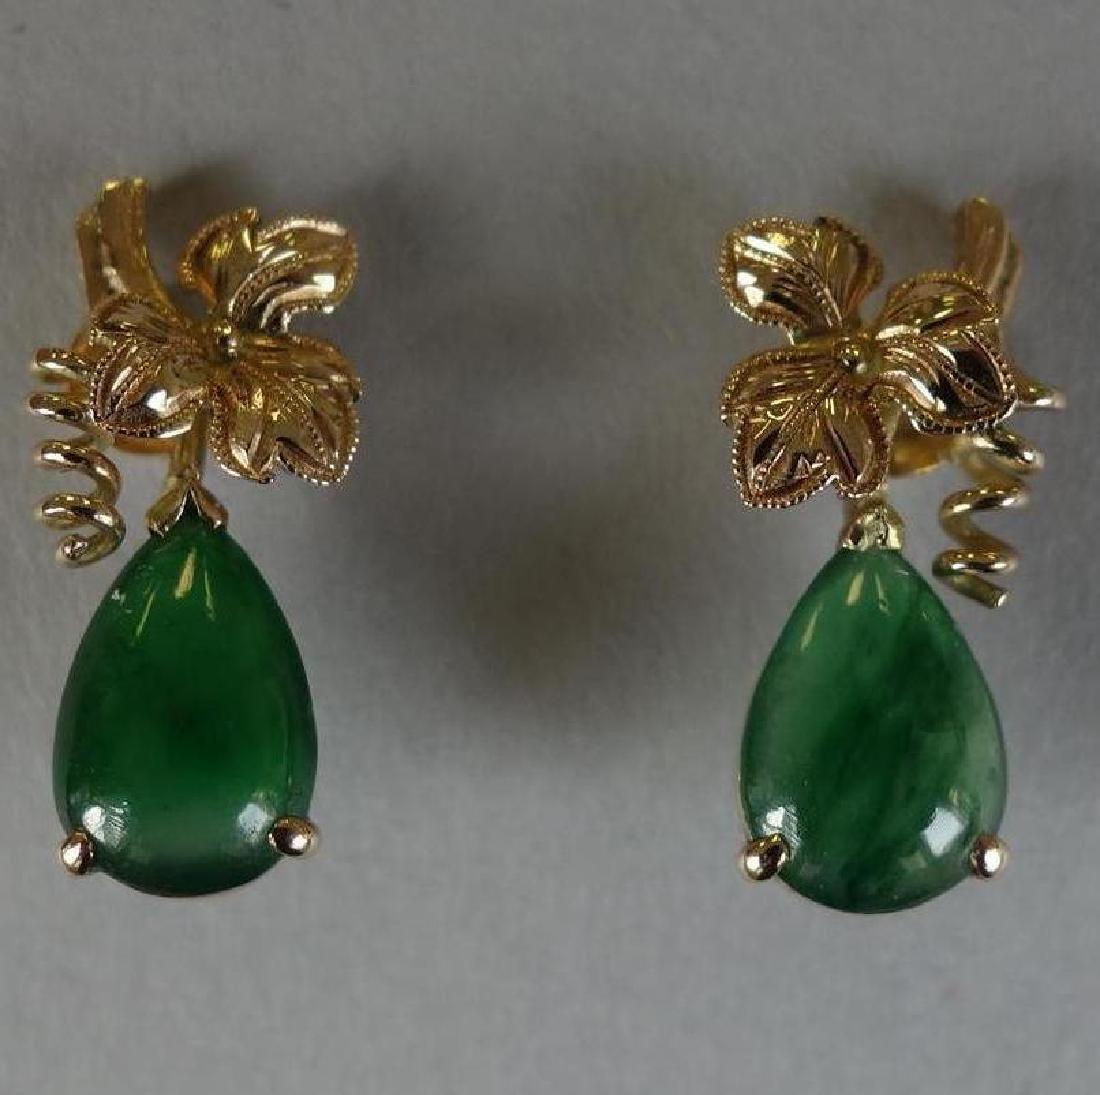 Chinese Natural Apple Green Jadeite Earrings